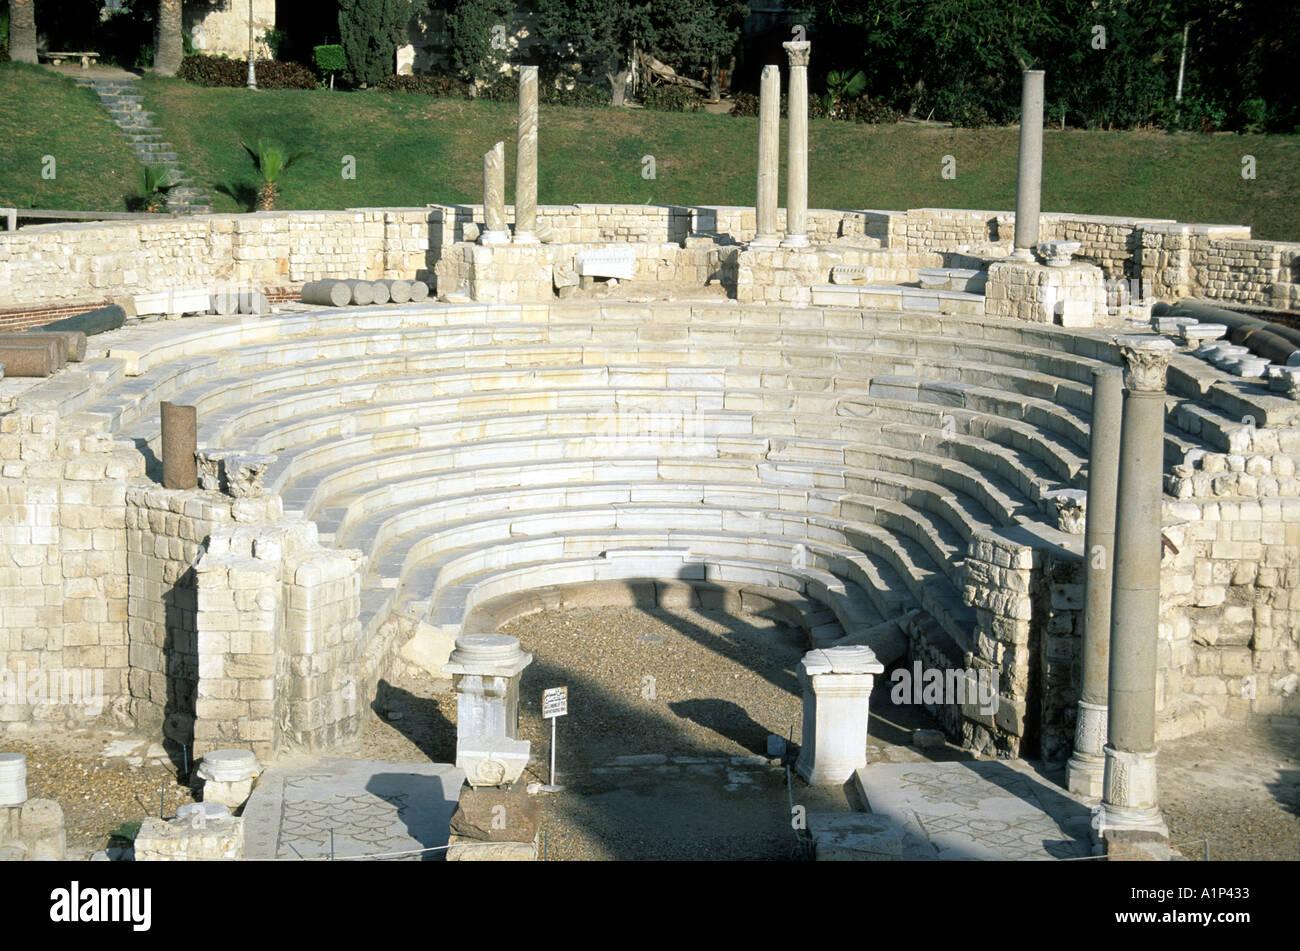 Roman Amphitheater Alexandria Egypt Stock Photo